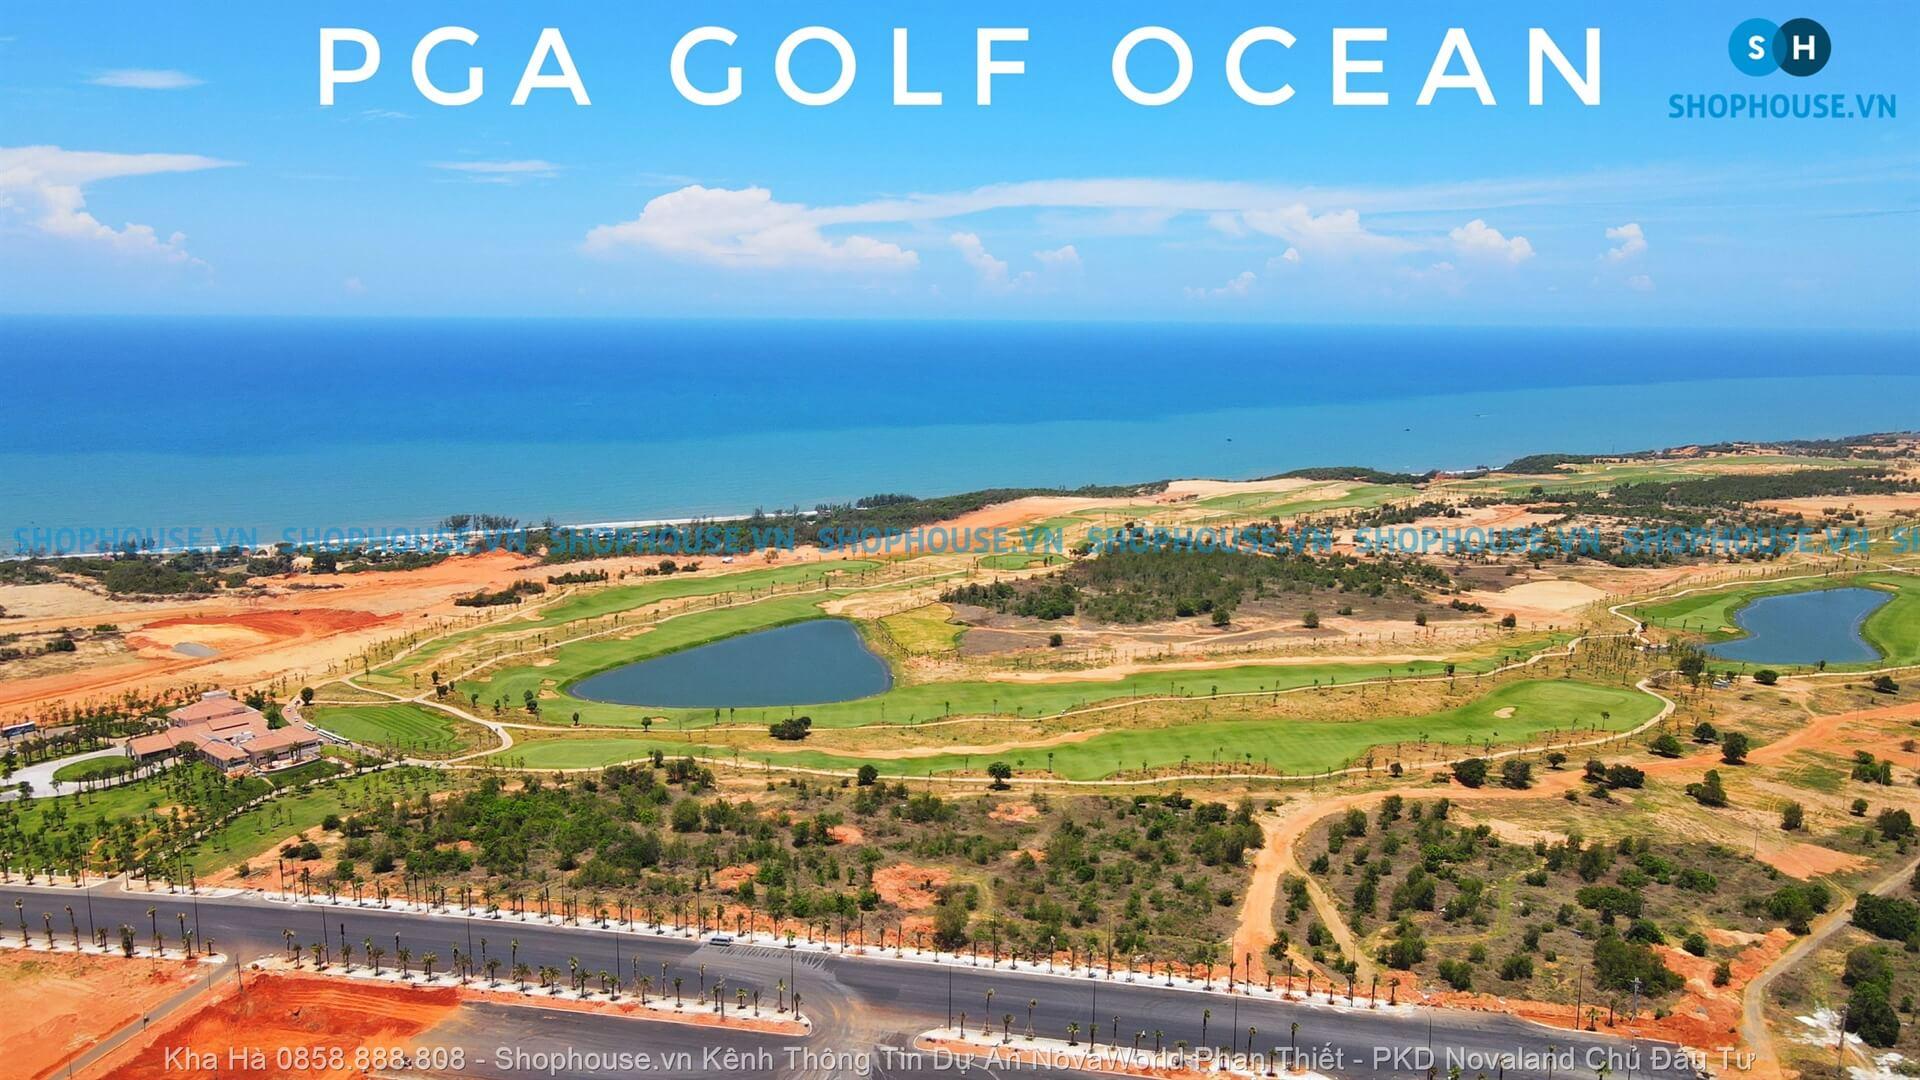 Pga-Golf-Ocean-18-hole-van-hanh-05-2021-NovaWorld-Phan-Thiet-update